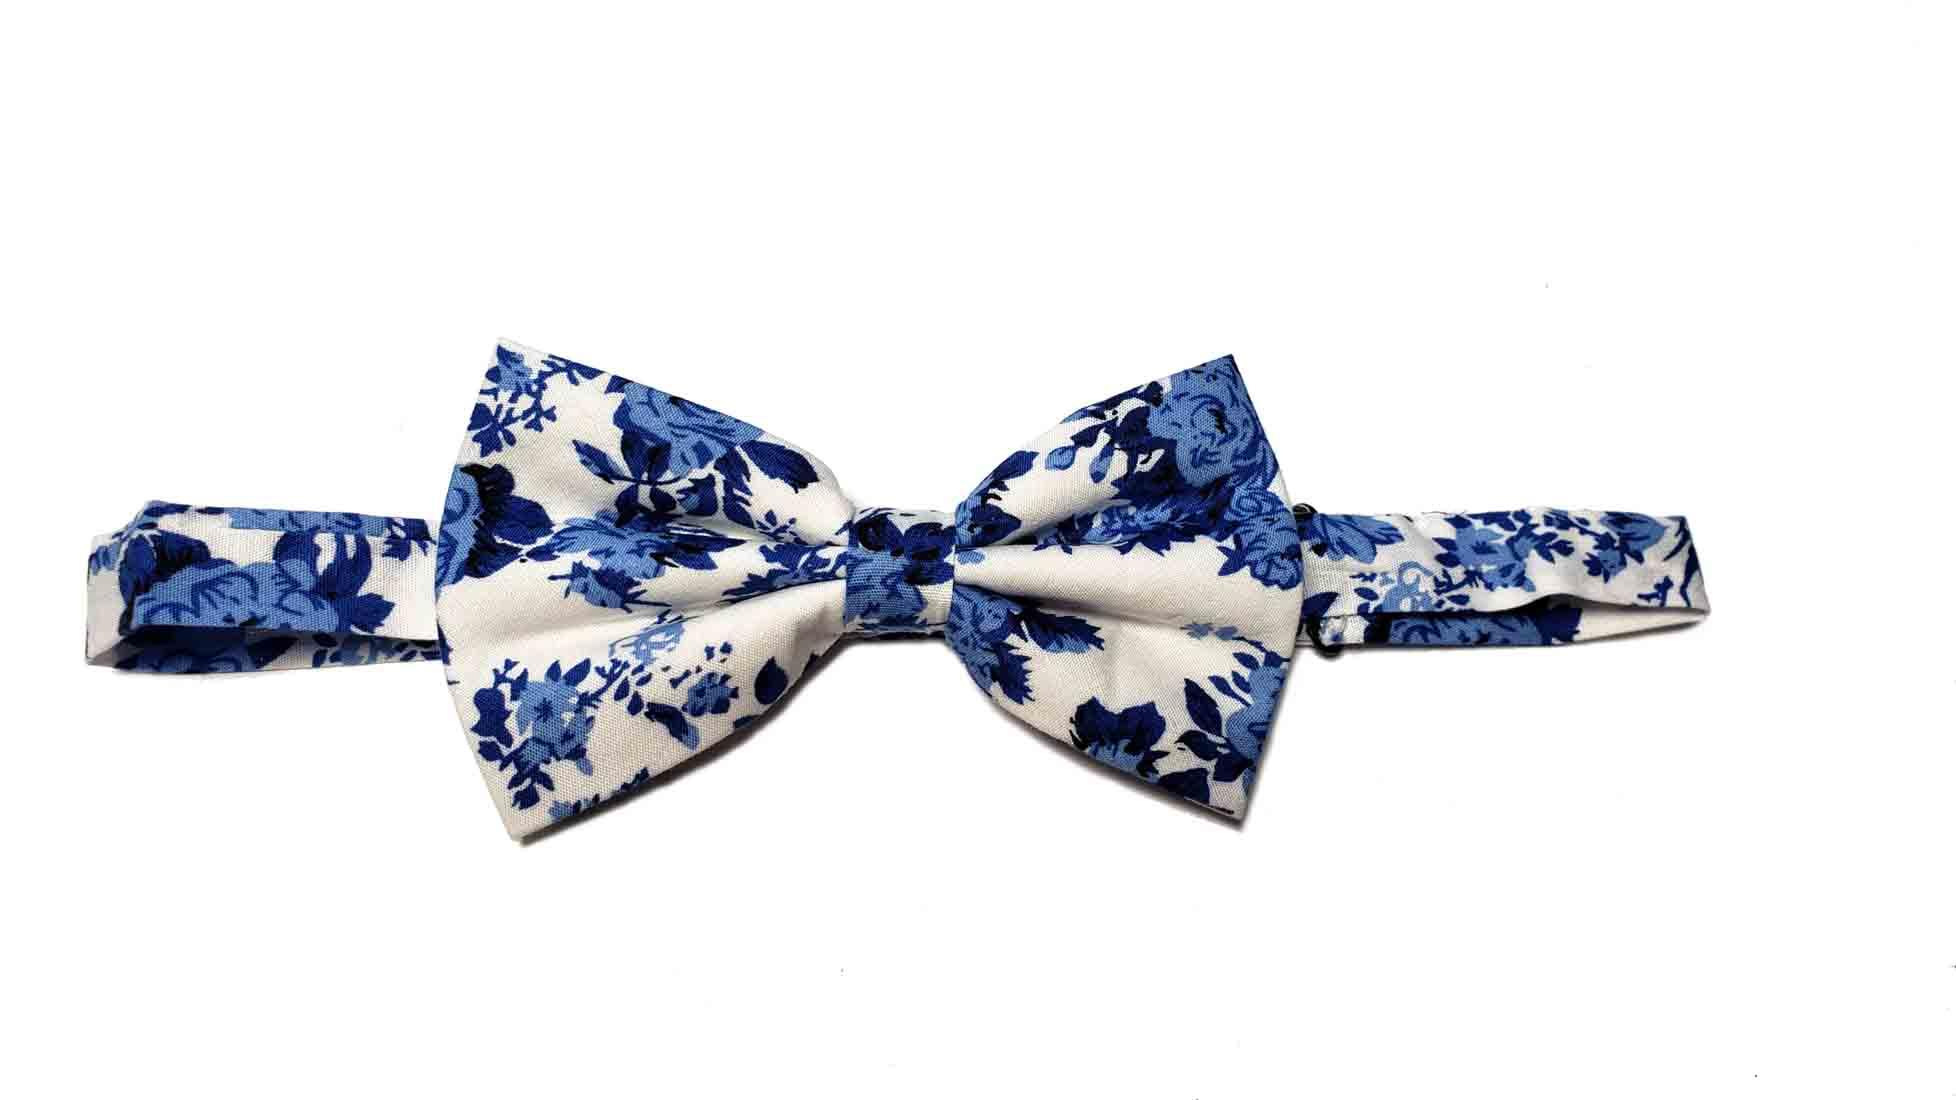 Gascoigne Floral Cotton Bow Tie Blue White Pre-Tied Men's